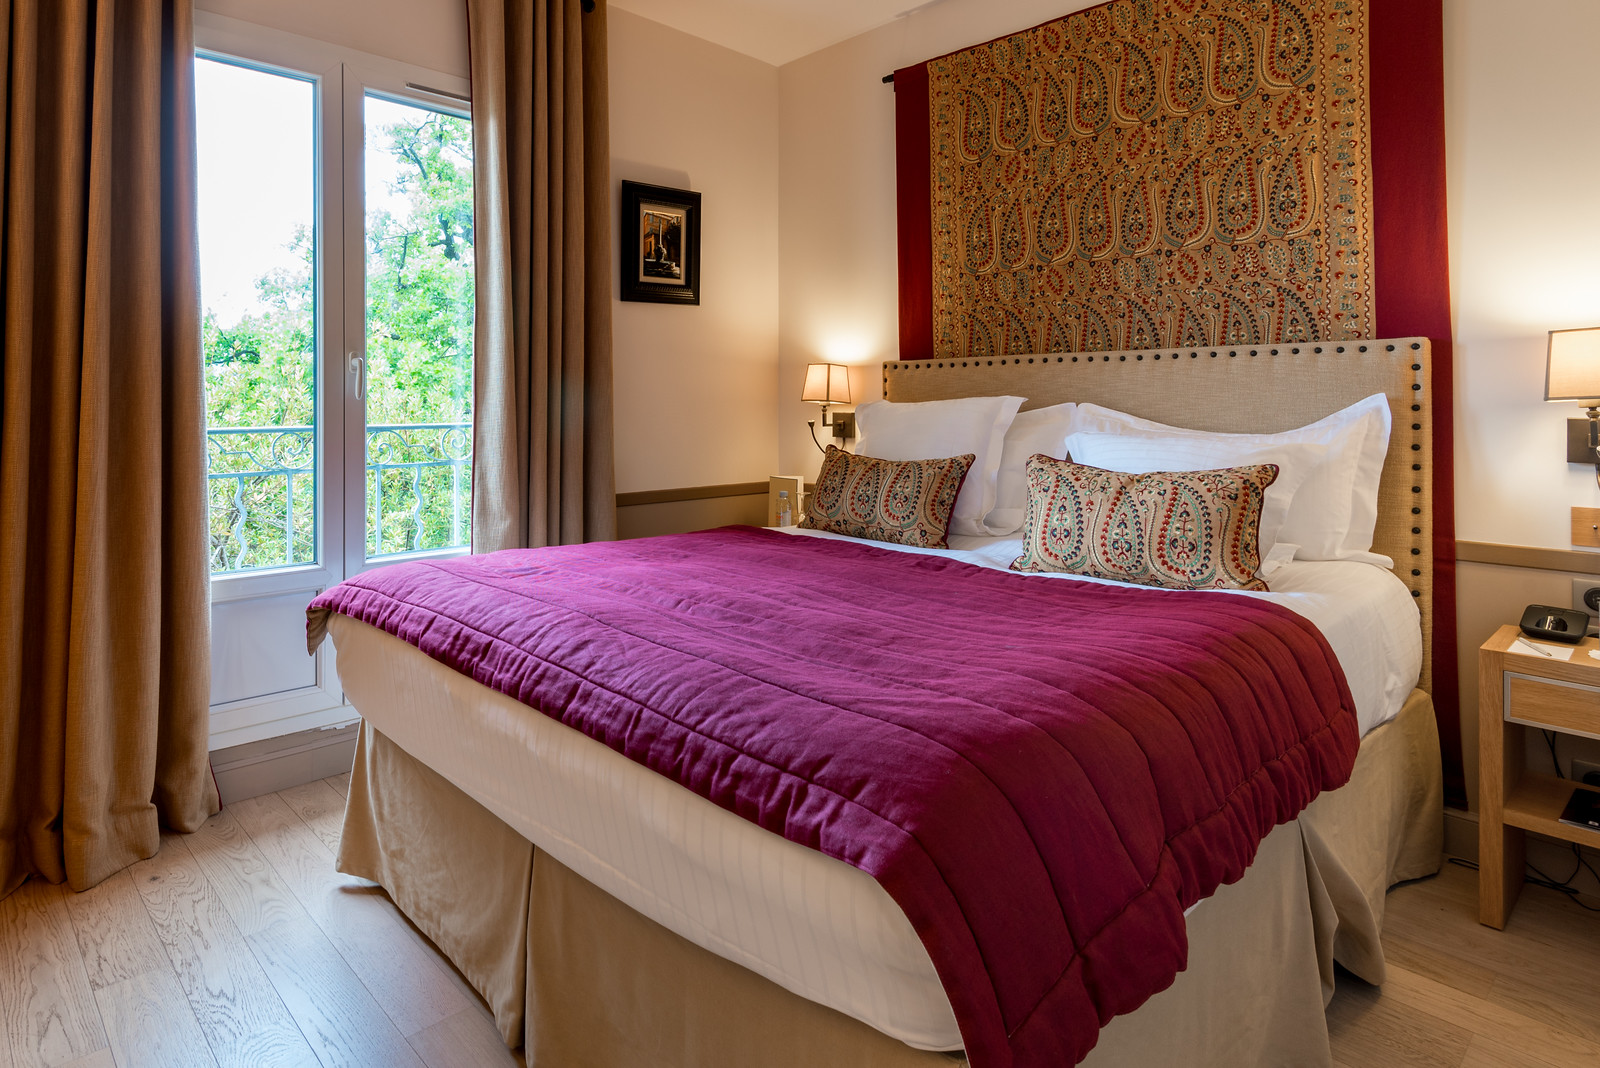 Our bedroom at Hotel Le Pigonnet   Aix en Provence, France